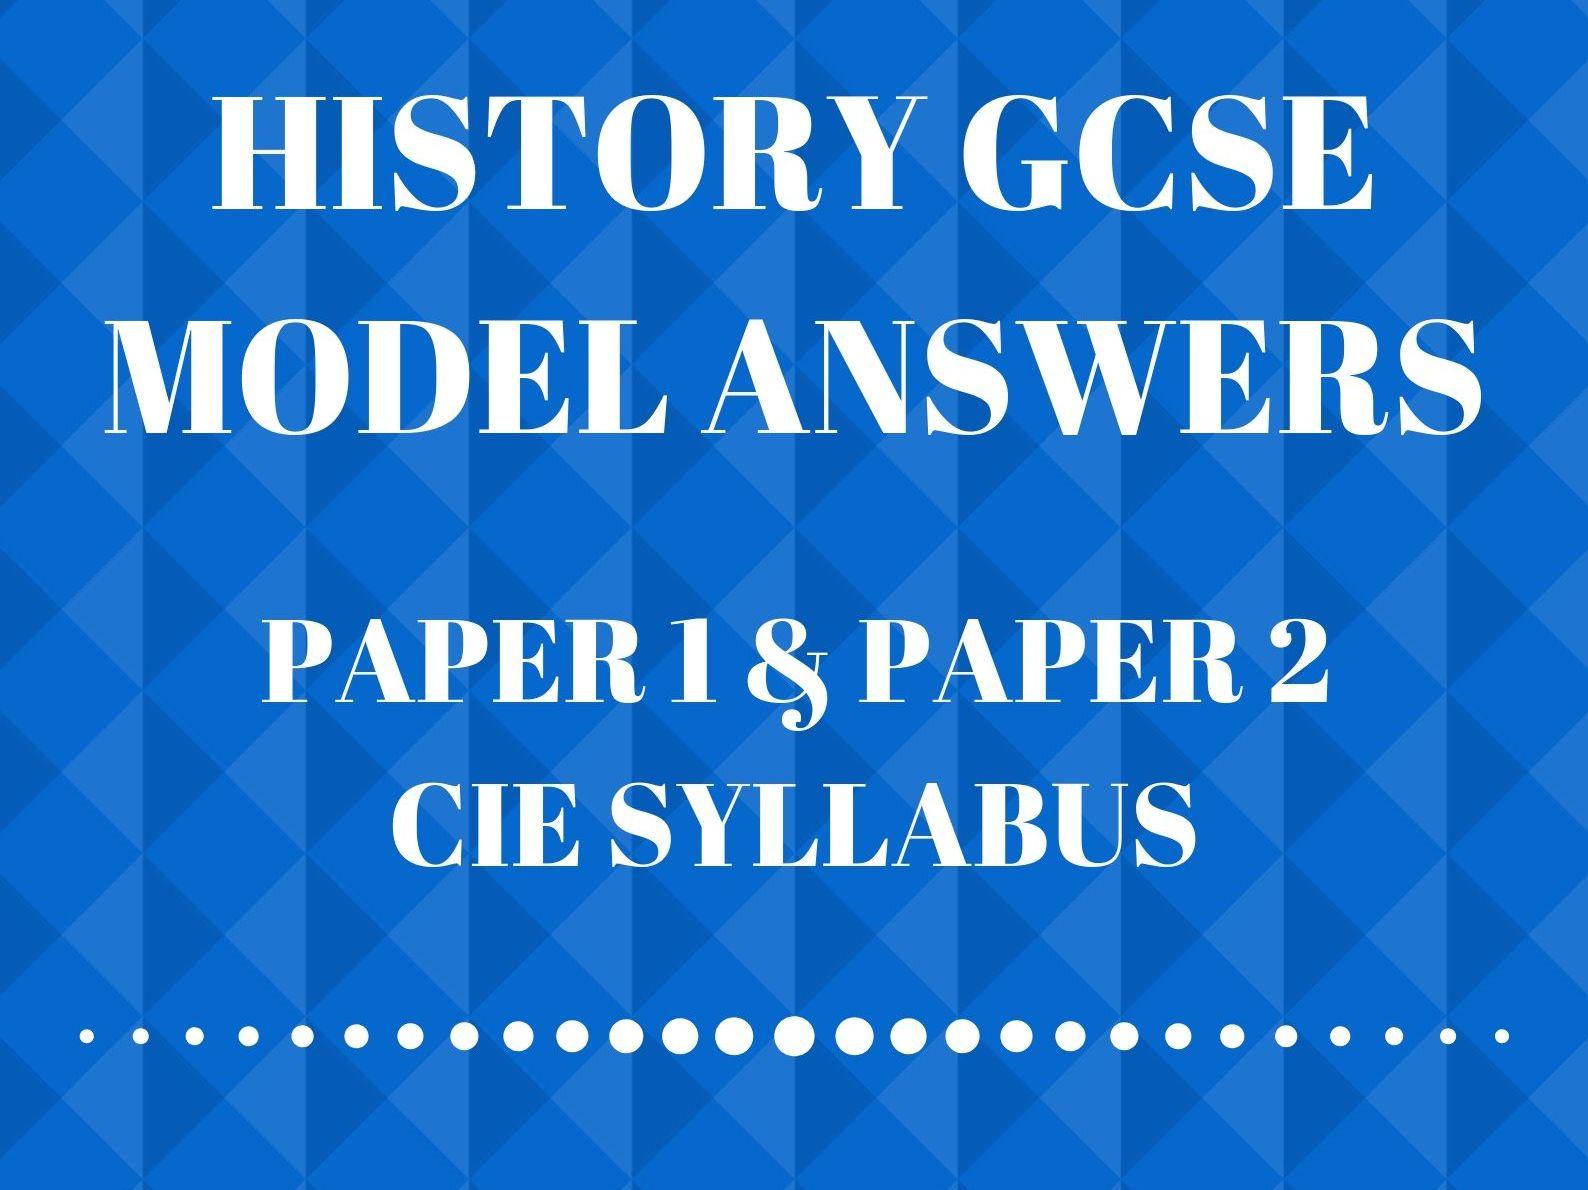 History GCSE: Paper 1 & Paper 2 Model Answers